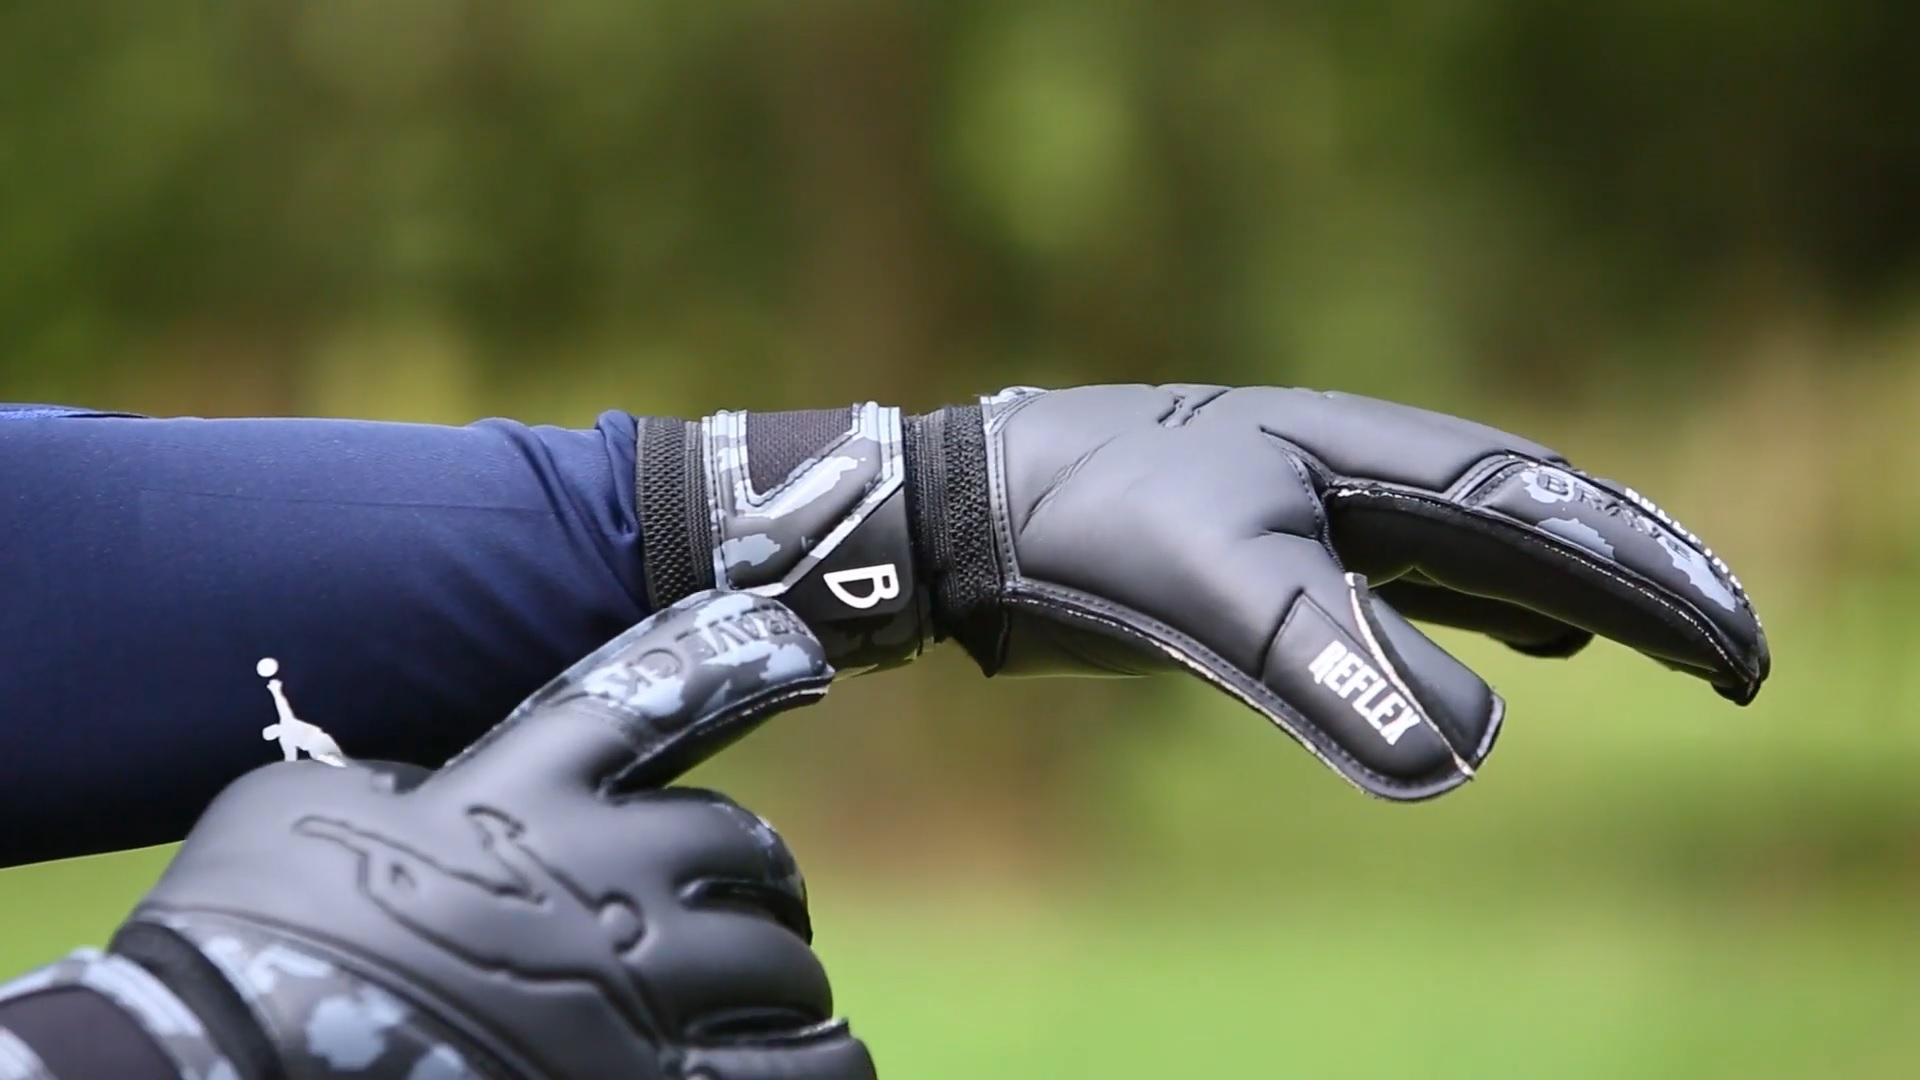 Вратарские перчатки Brave GK Reflex-официальный интернет-магазин Brave GK